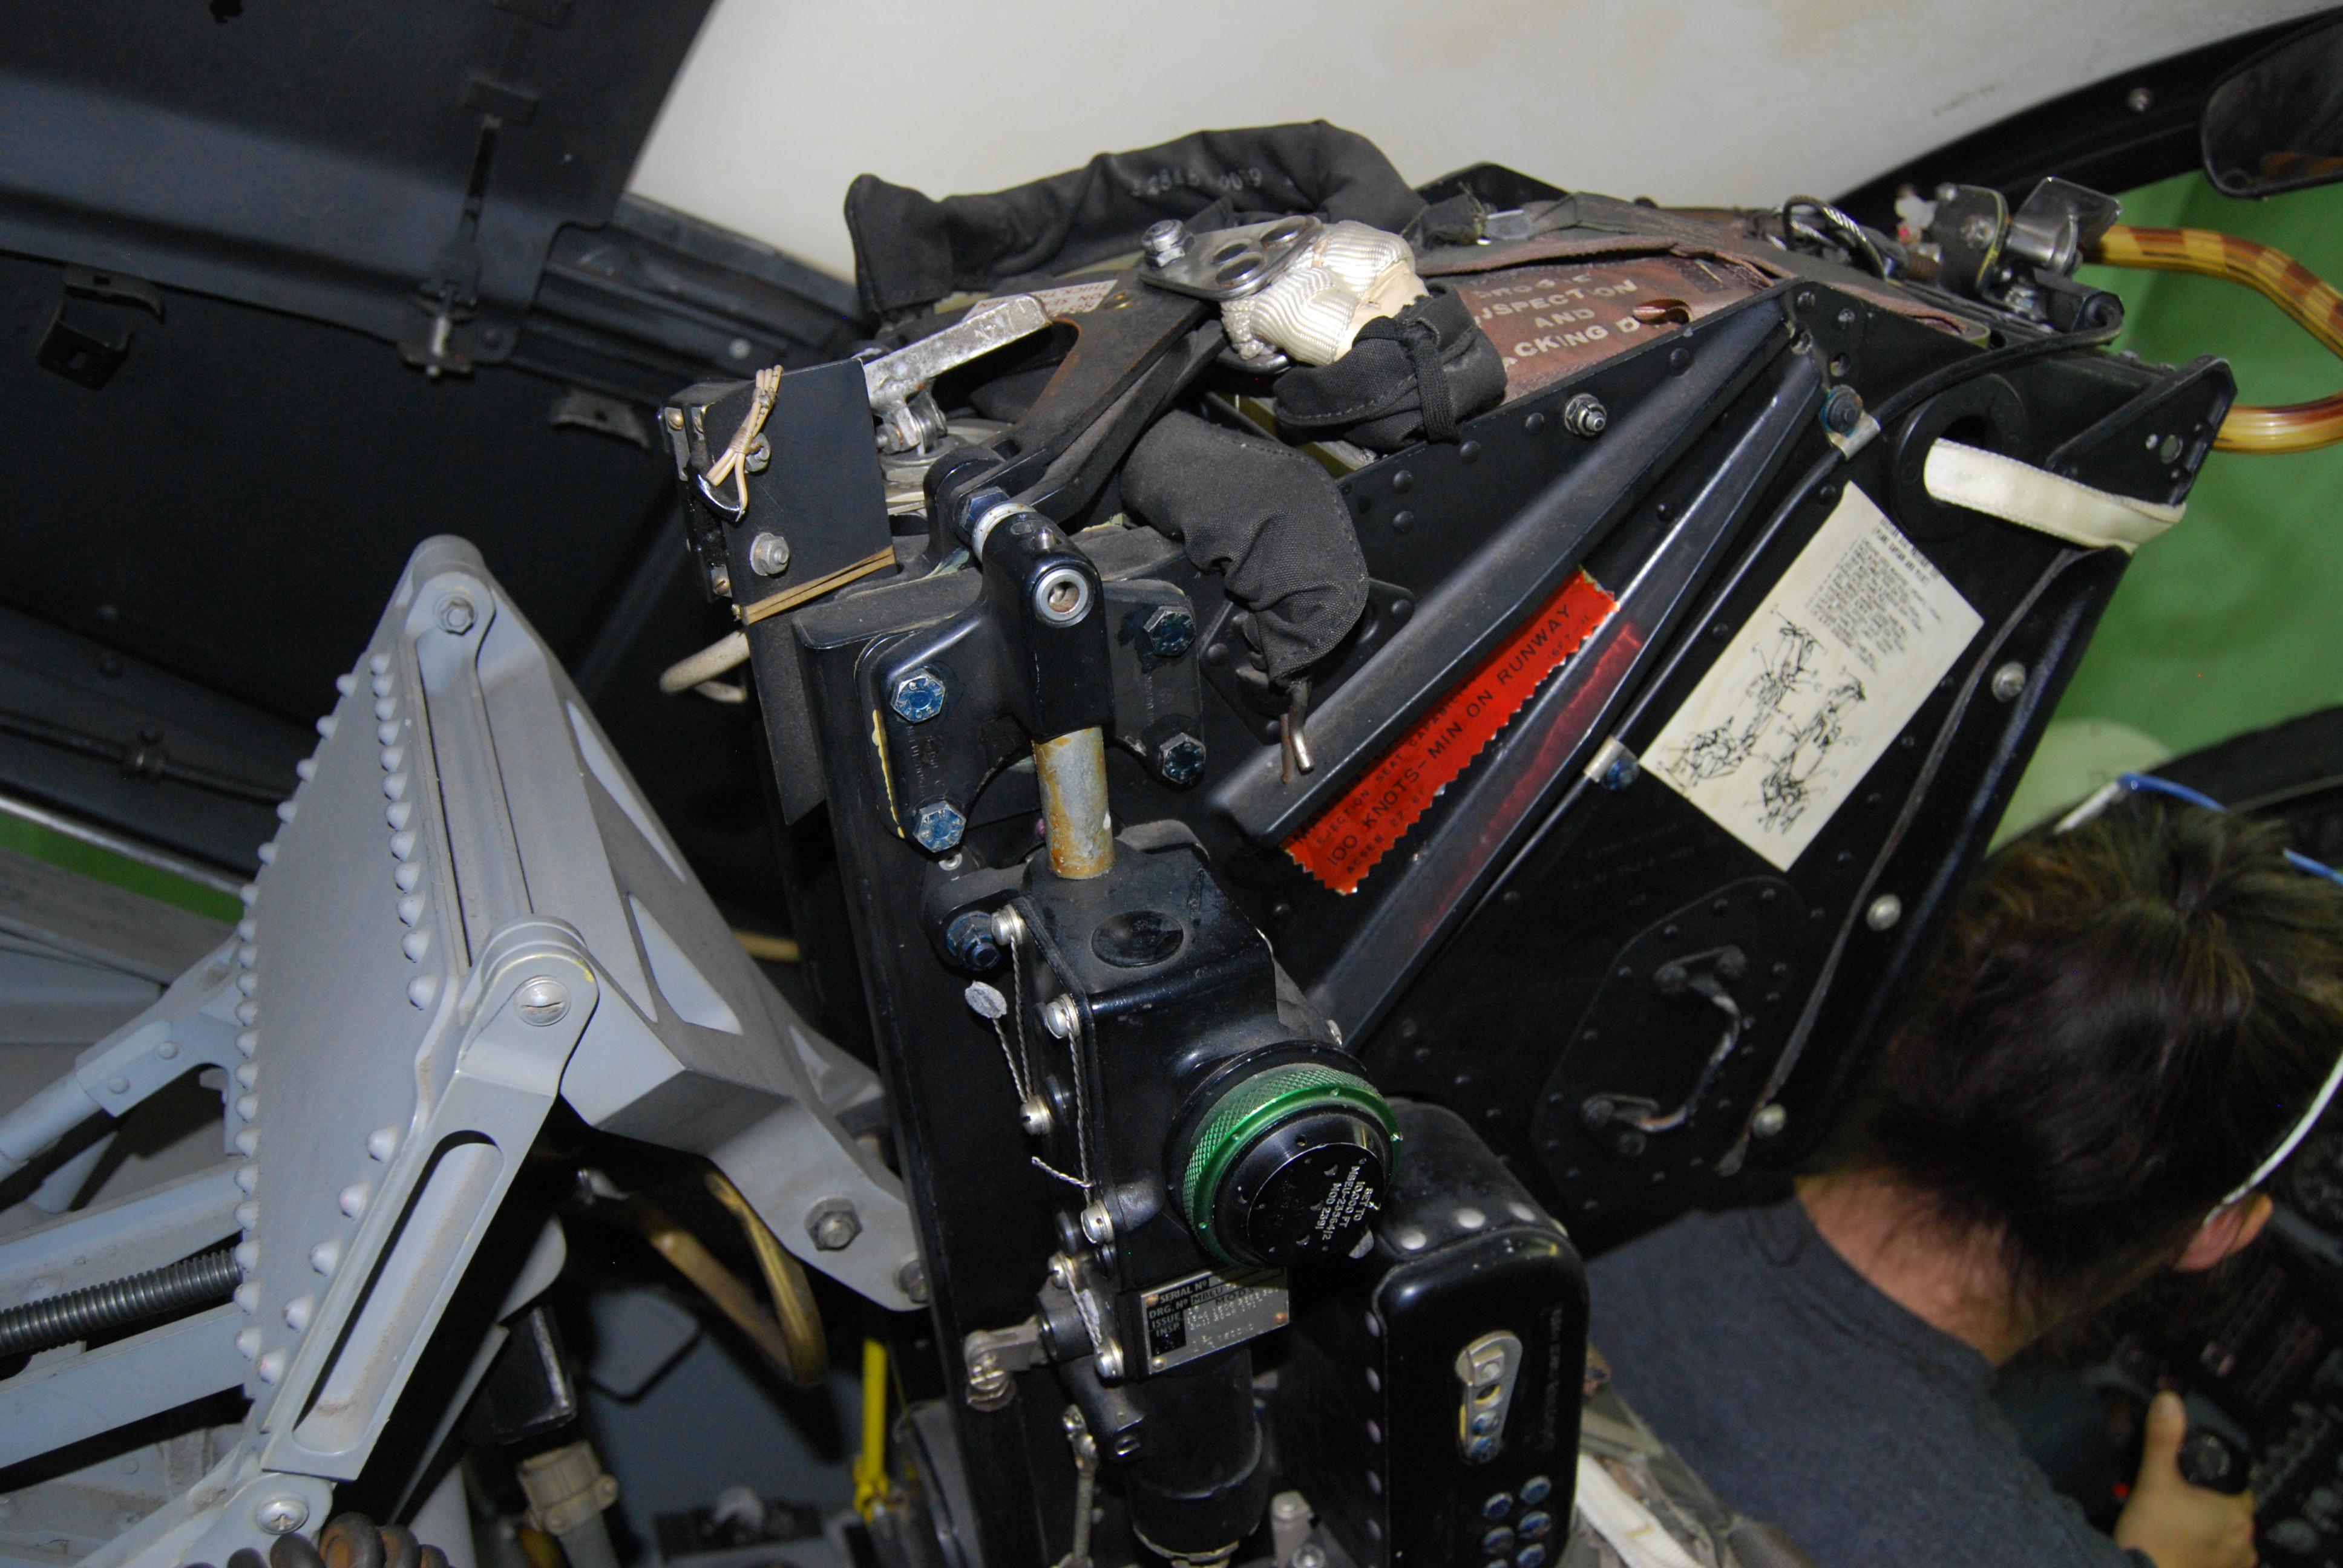 File:Grumman A-6A Simulator Pilots Martin Baker Mk GRU-5 ejection seat ...